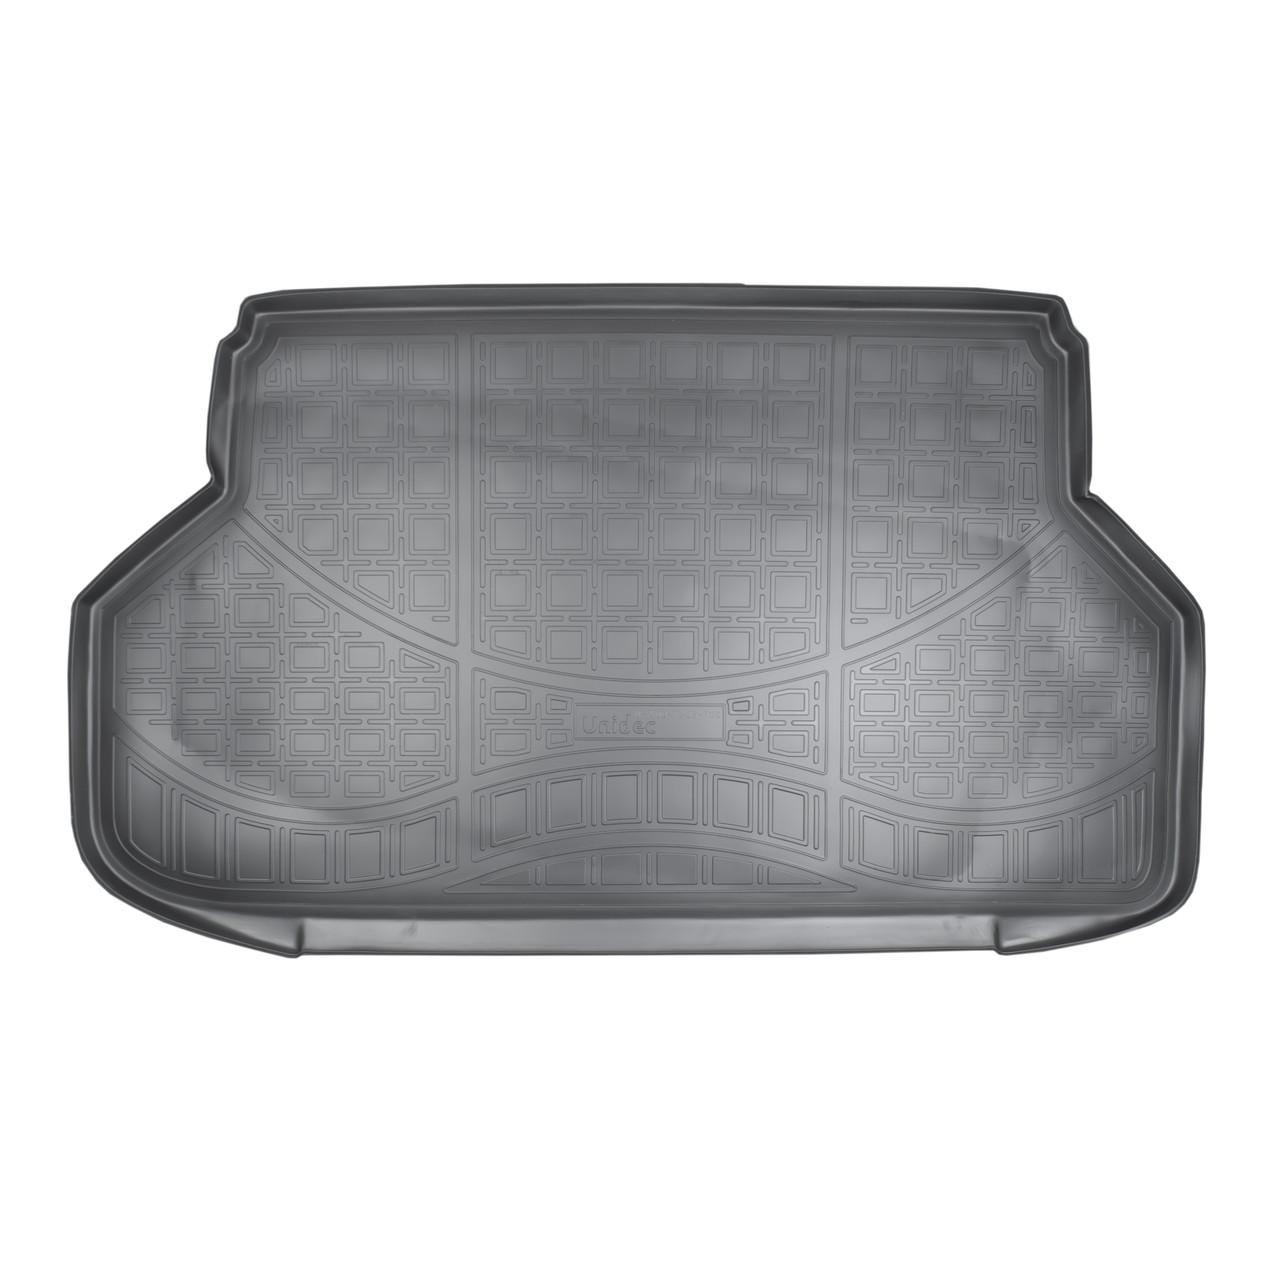 Коврик в багажник Faw V5 седан (2012-2017)